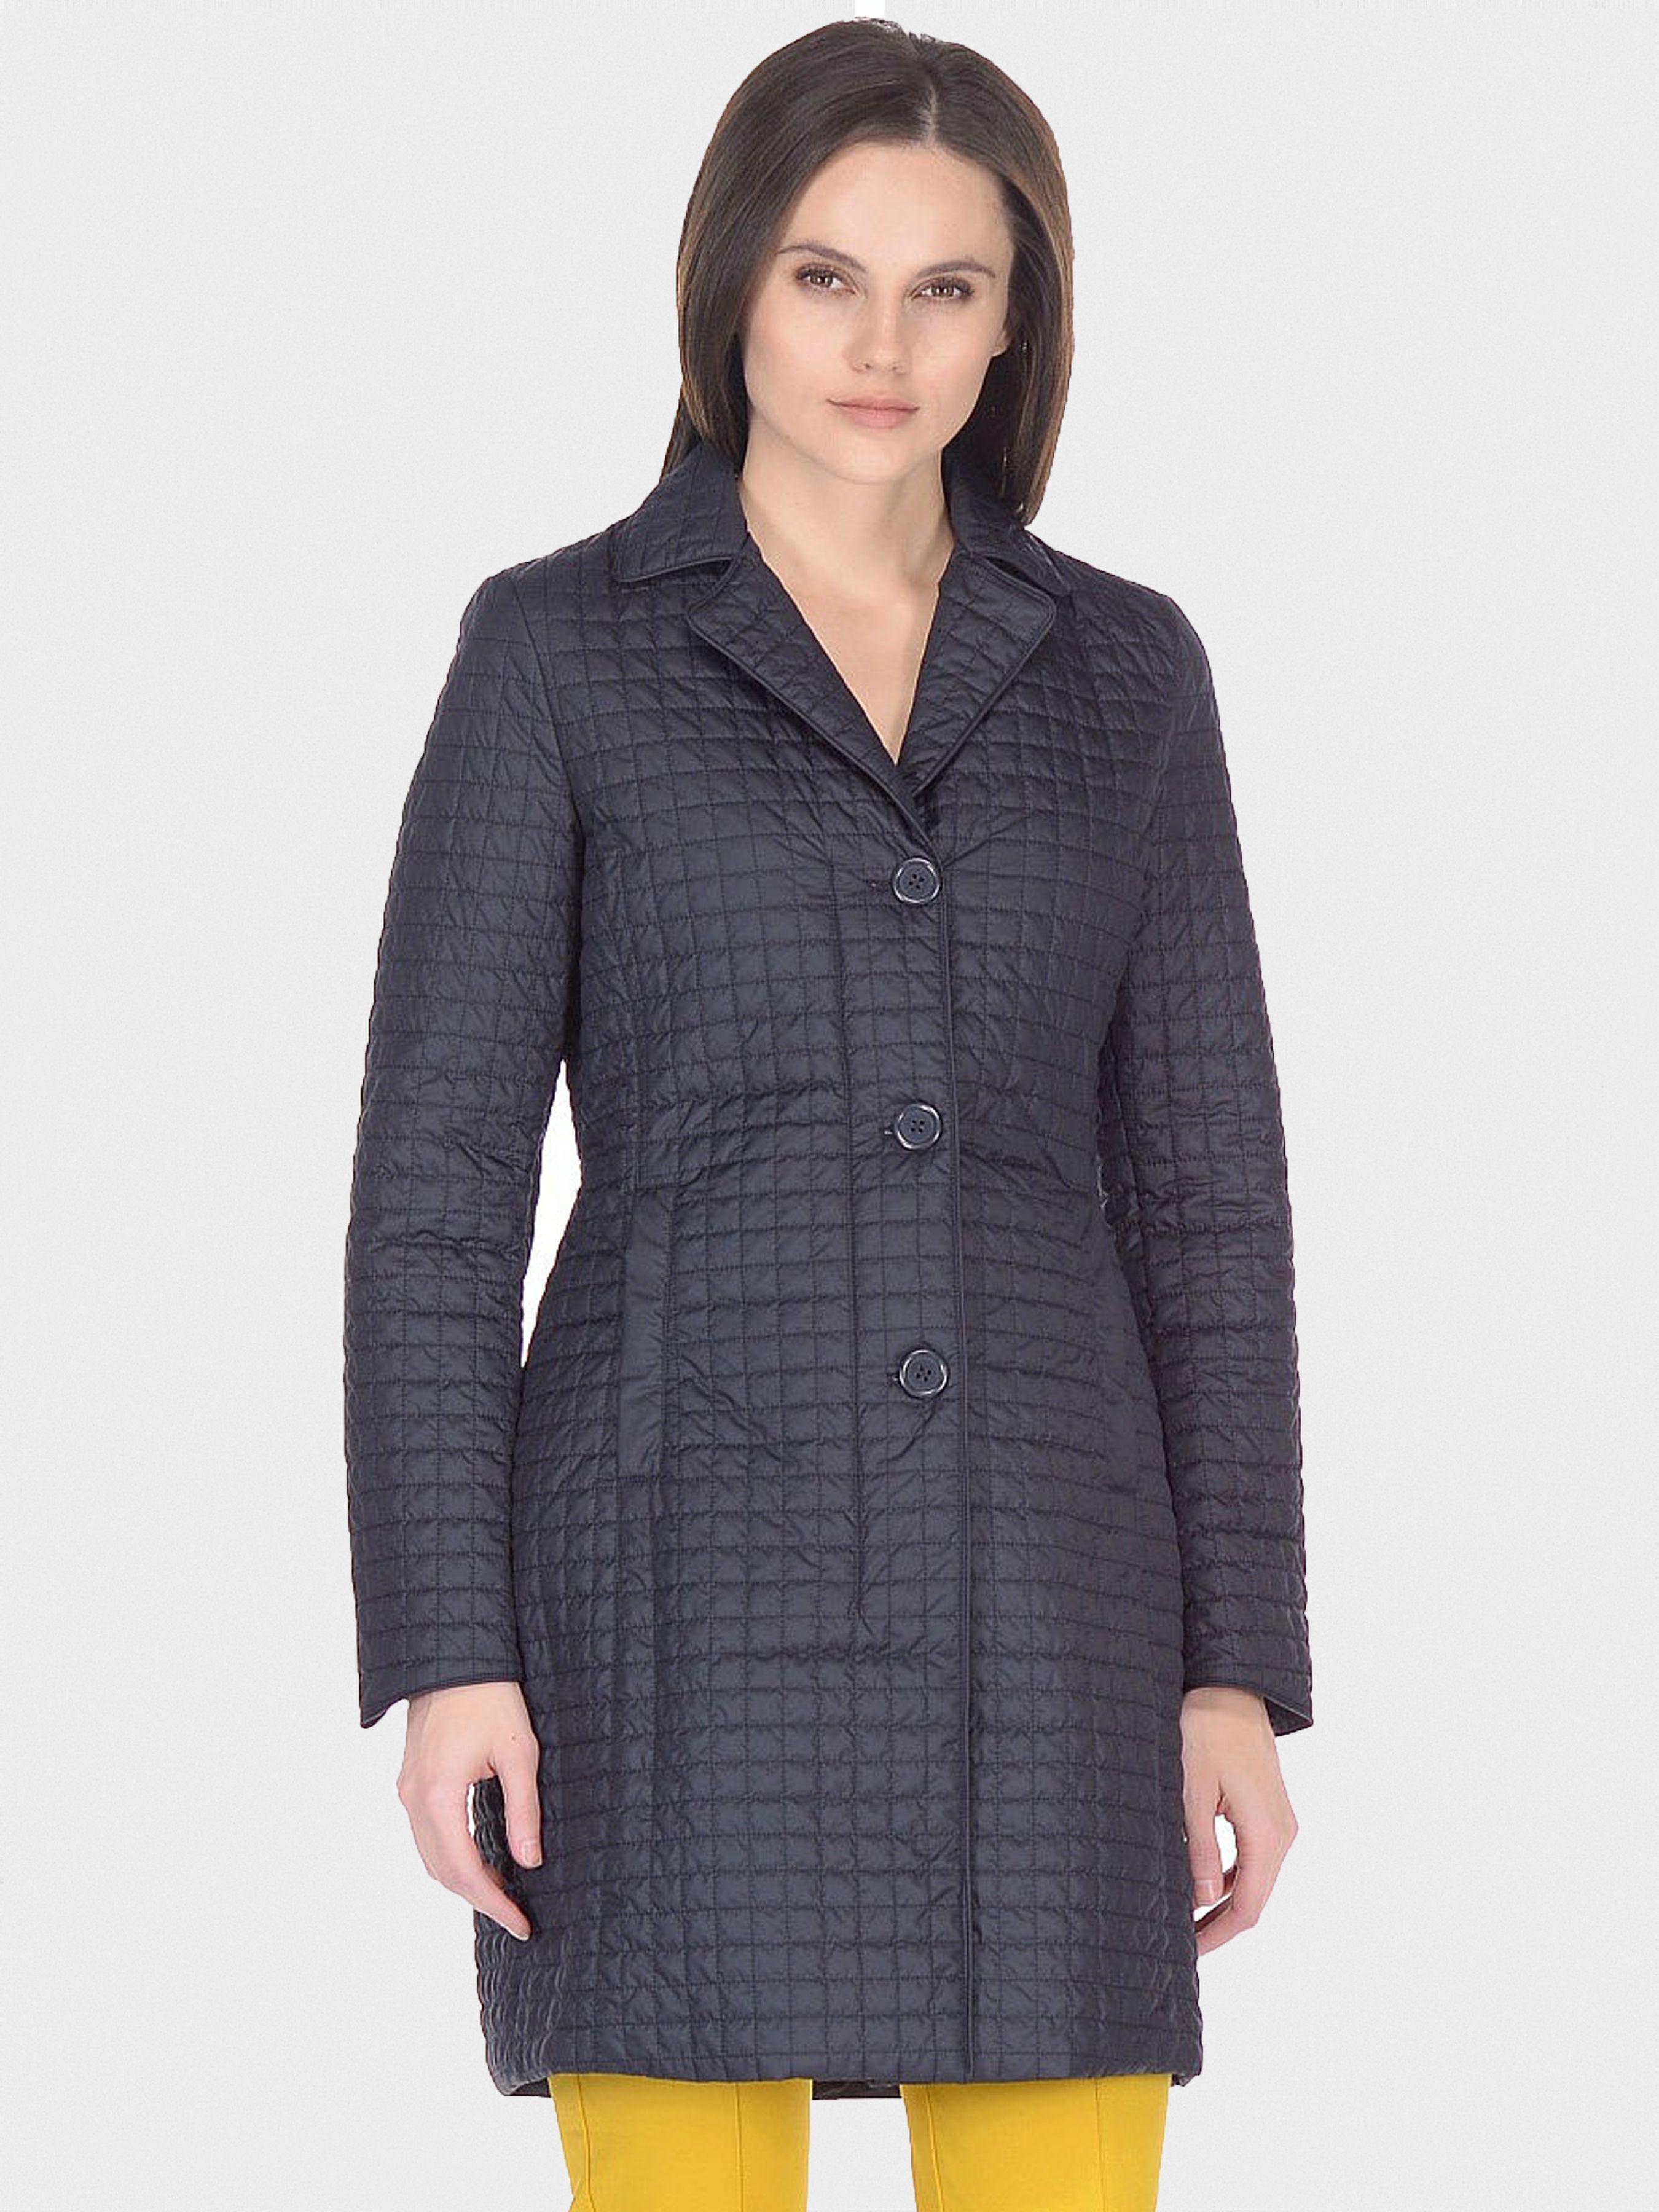 Плащ женские Geox WOMAN JACKET XA5925 цена, 2017